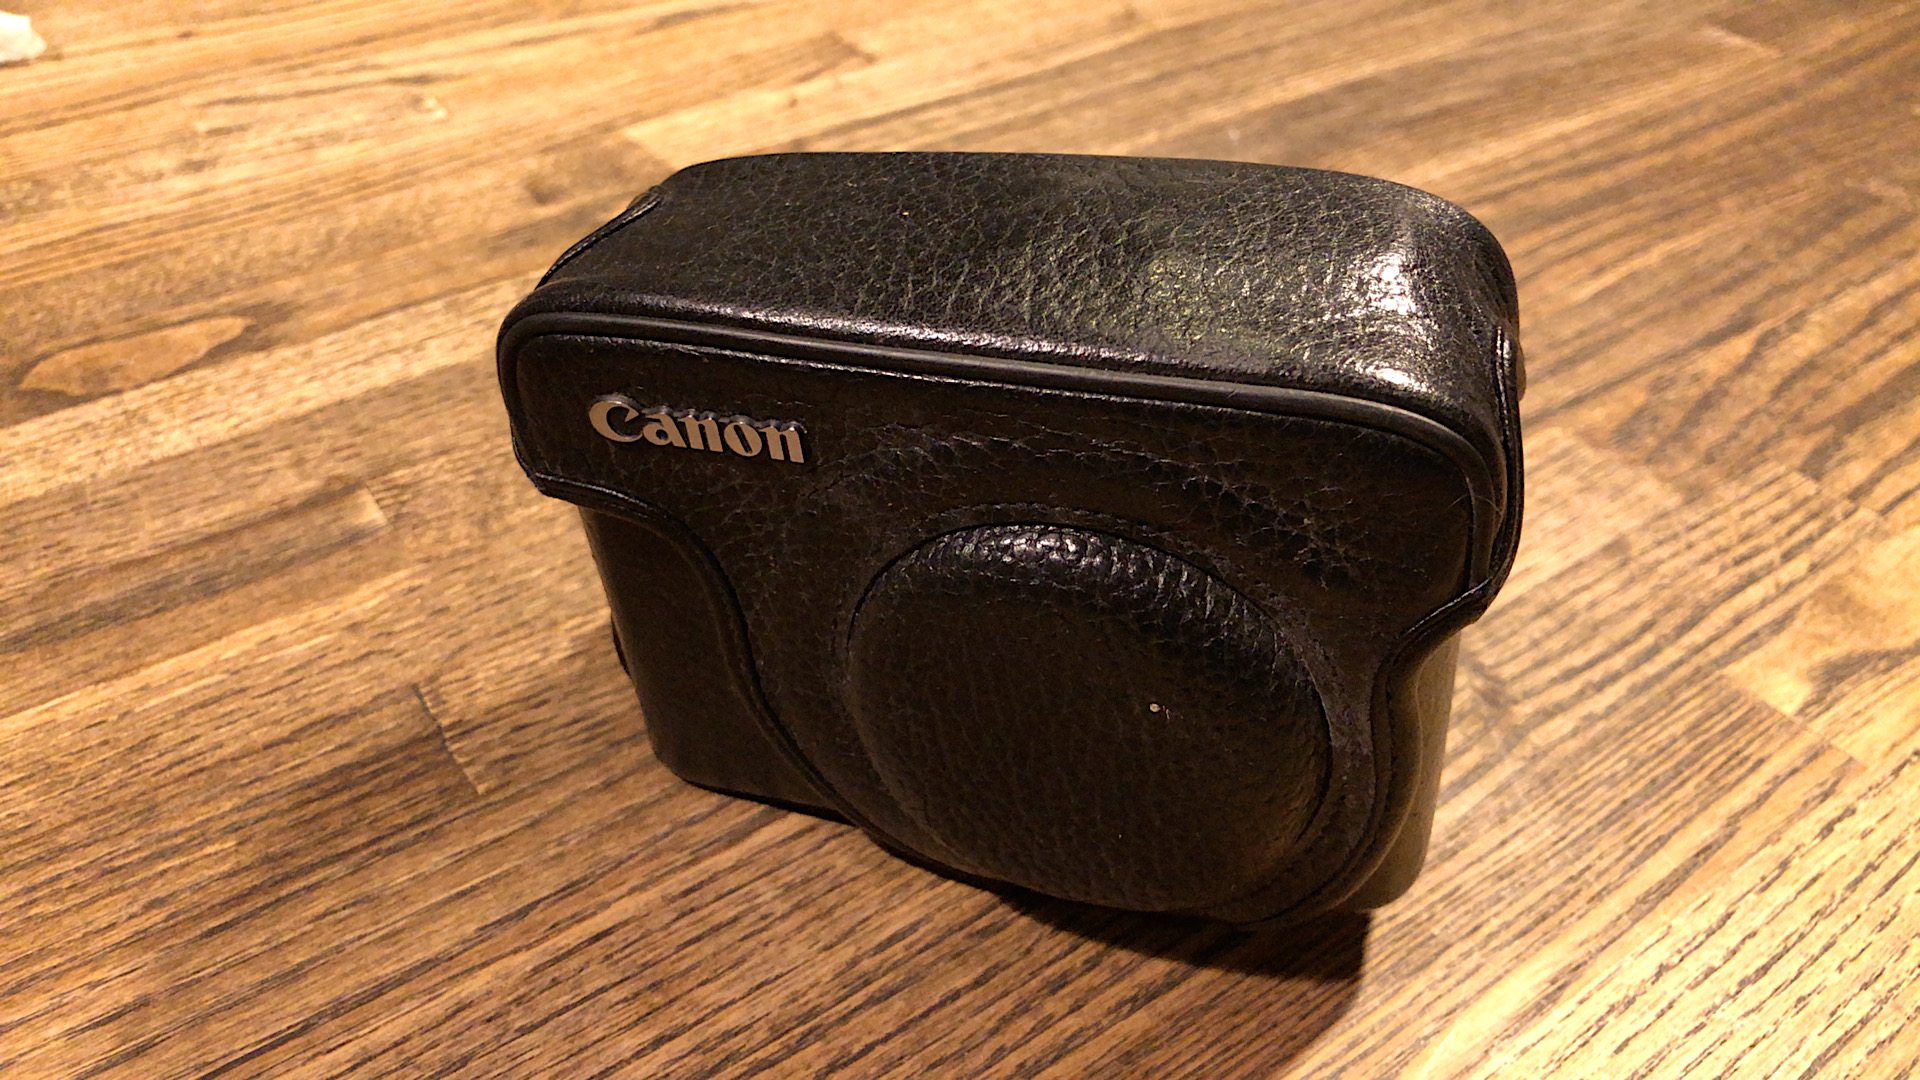 canon powershot G7 case